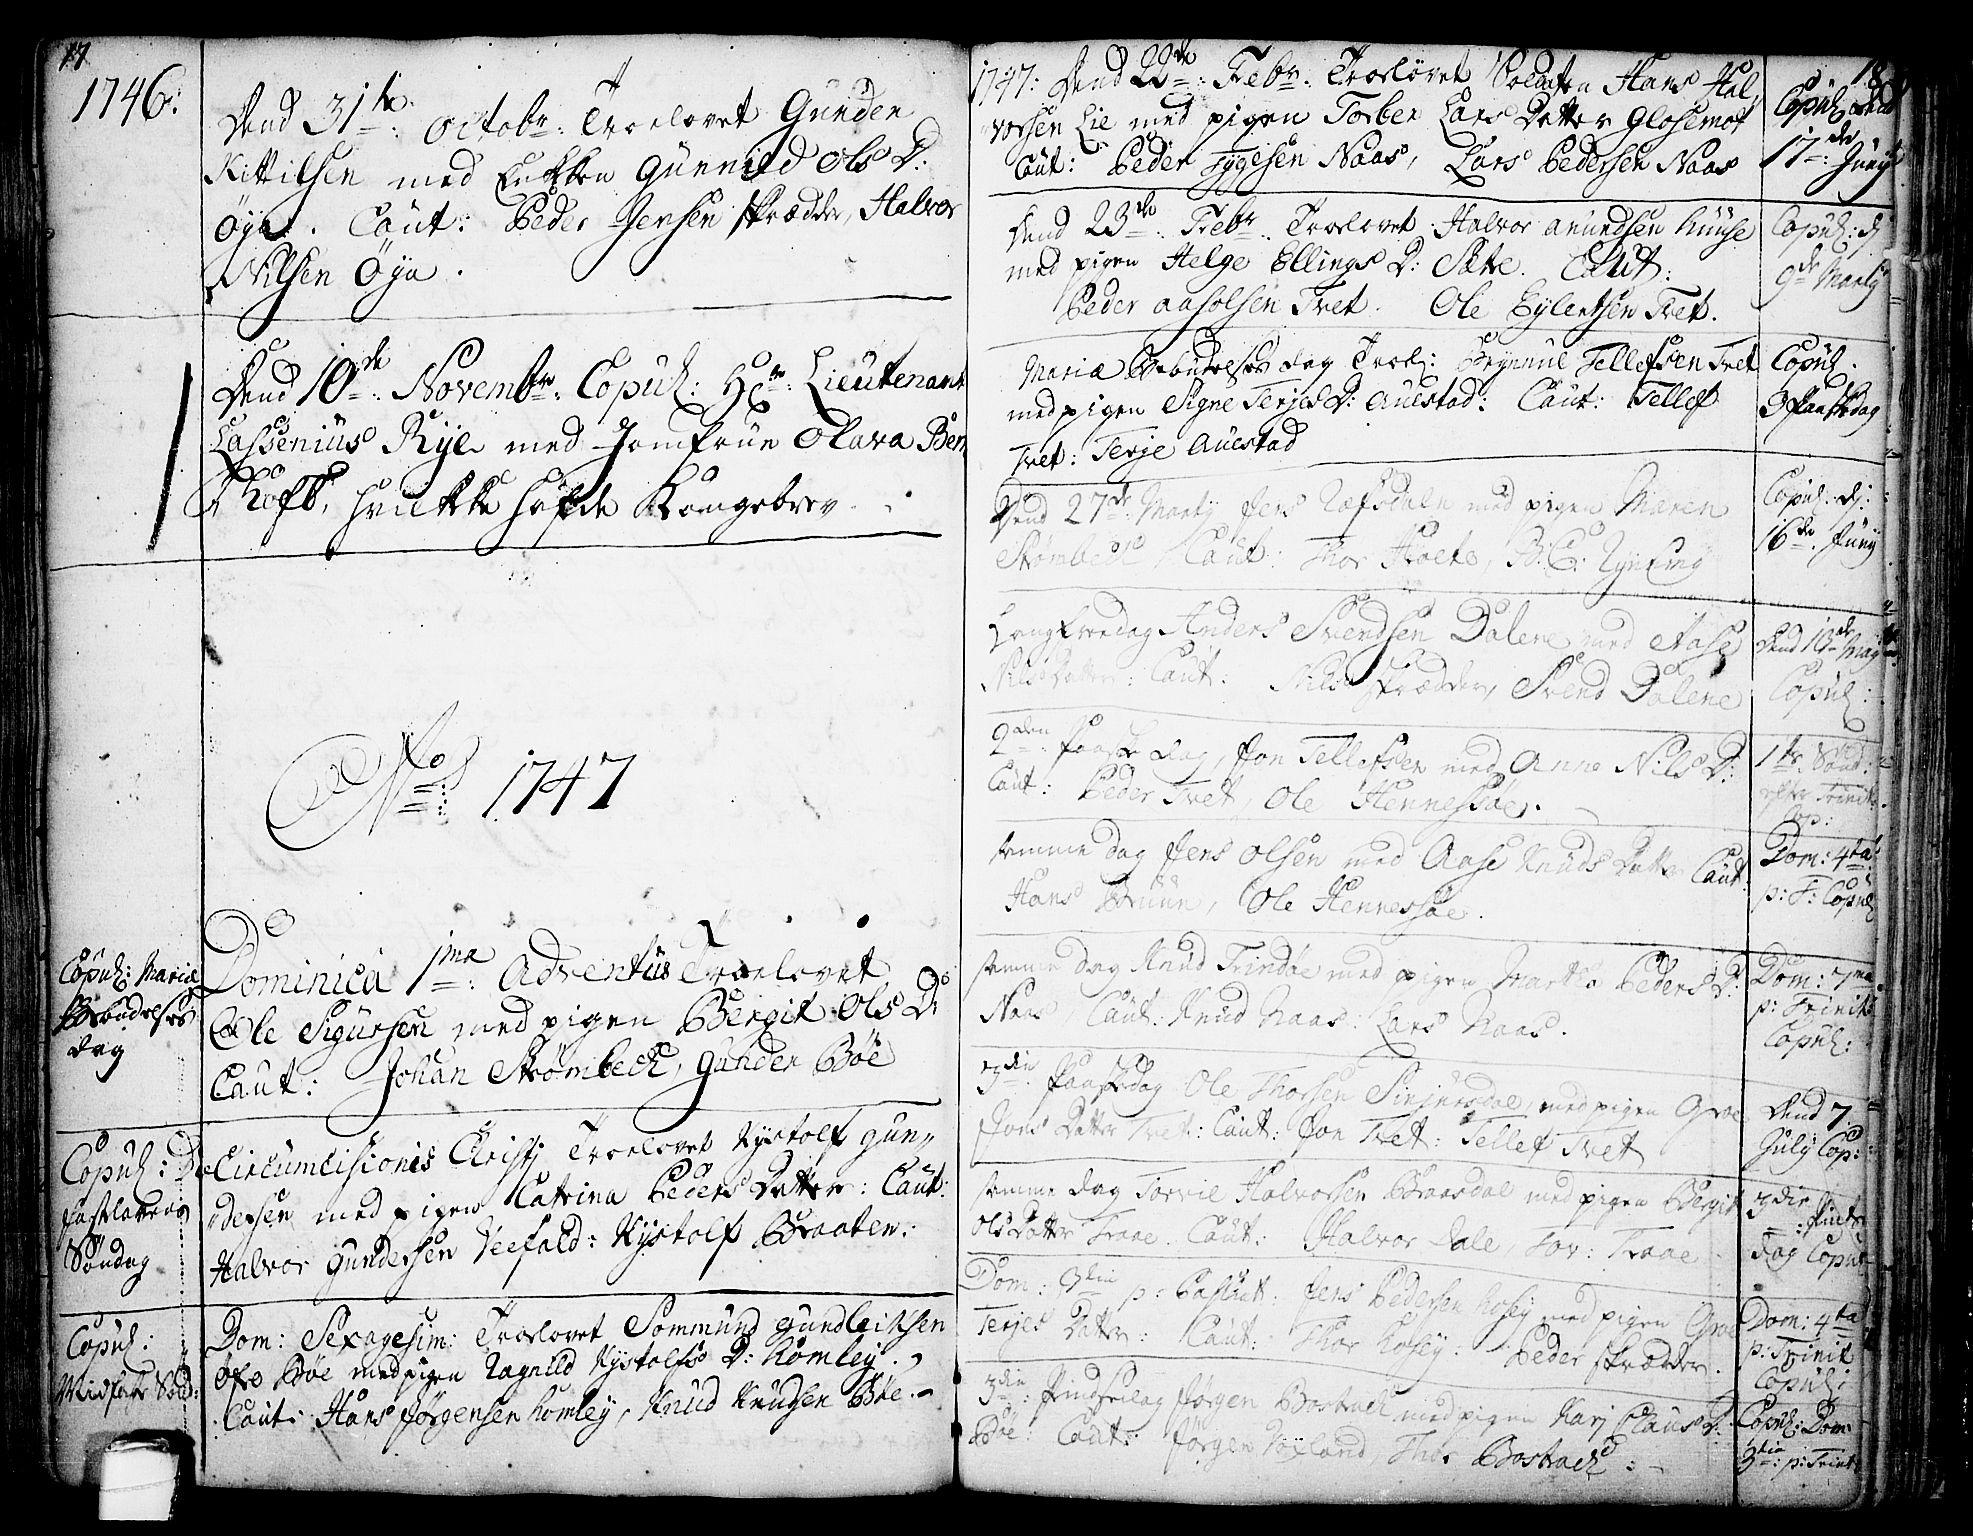 SAKO, Drangedal kirkebøker, F/Fa/L0002: Ministerialbok nr. 2, 1733-1753, s. 17-18